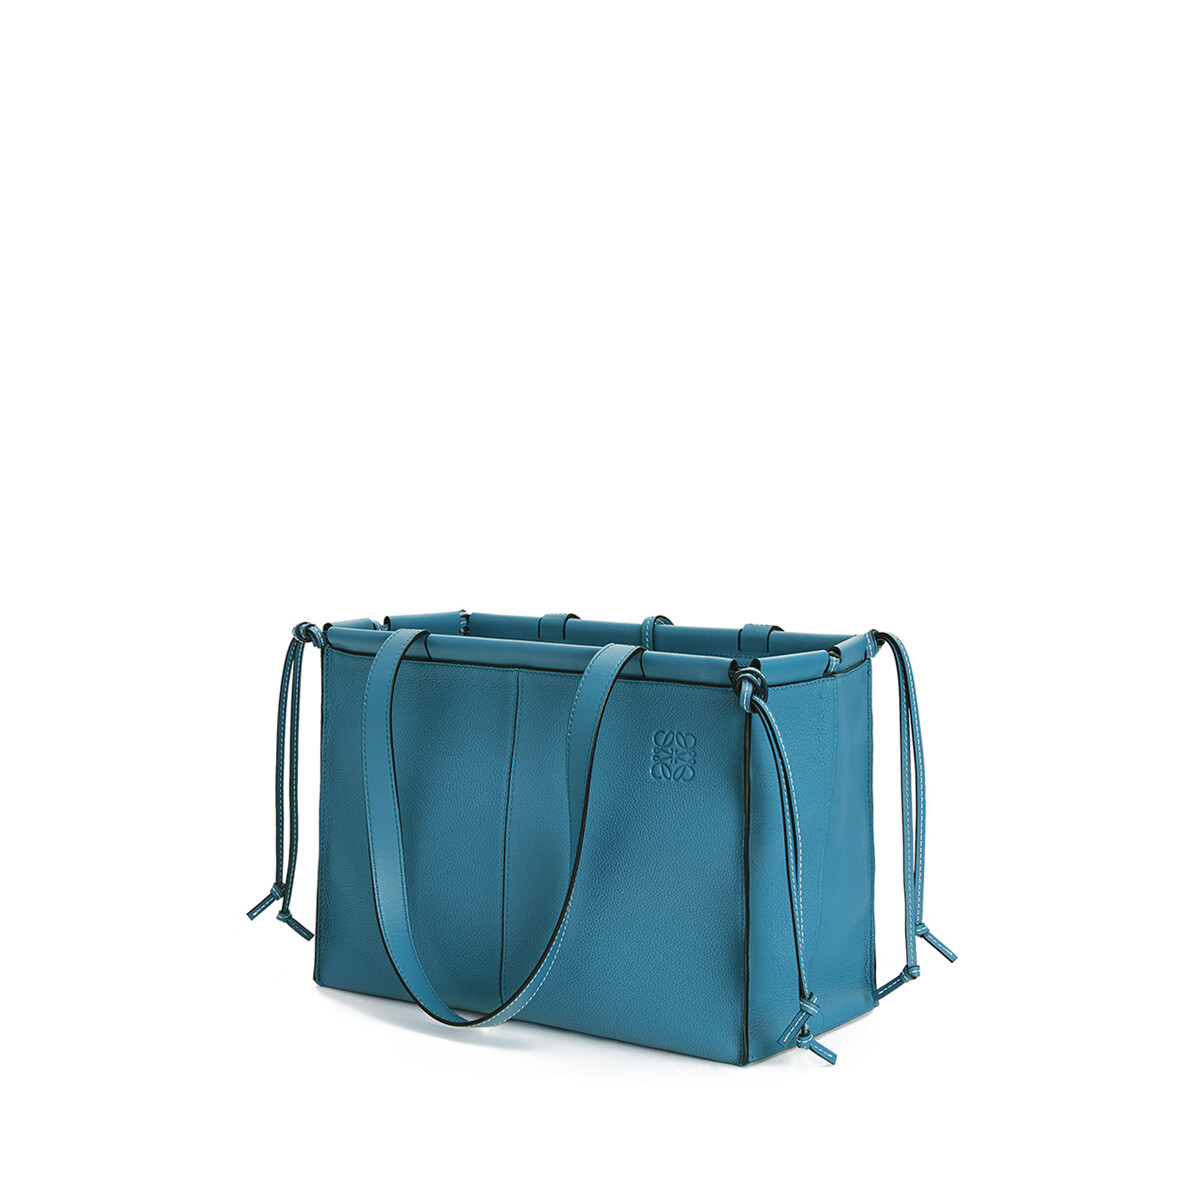 LOEWE Cushion Tote Small Bag Dark Lagoon front